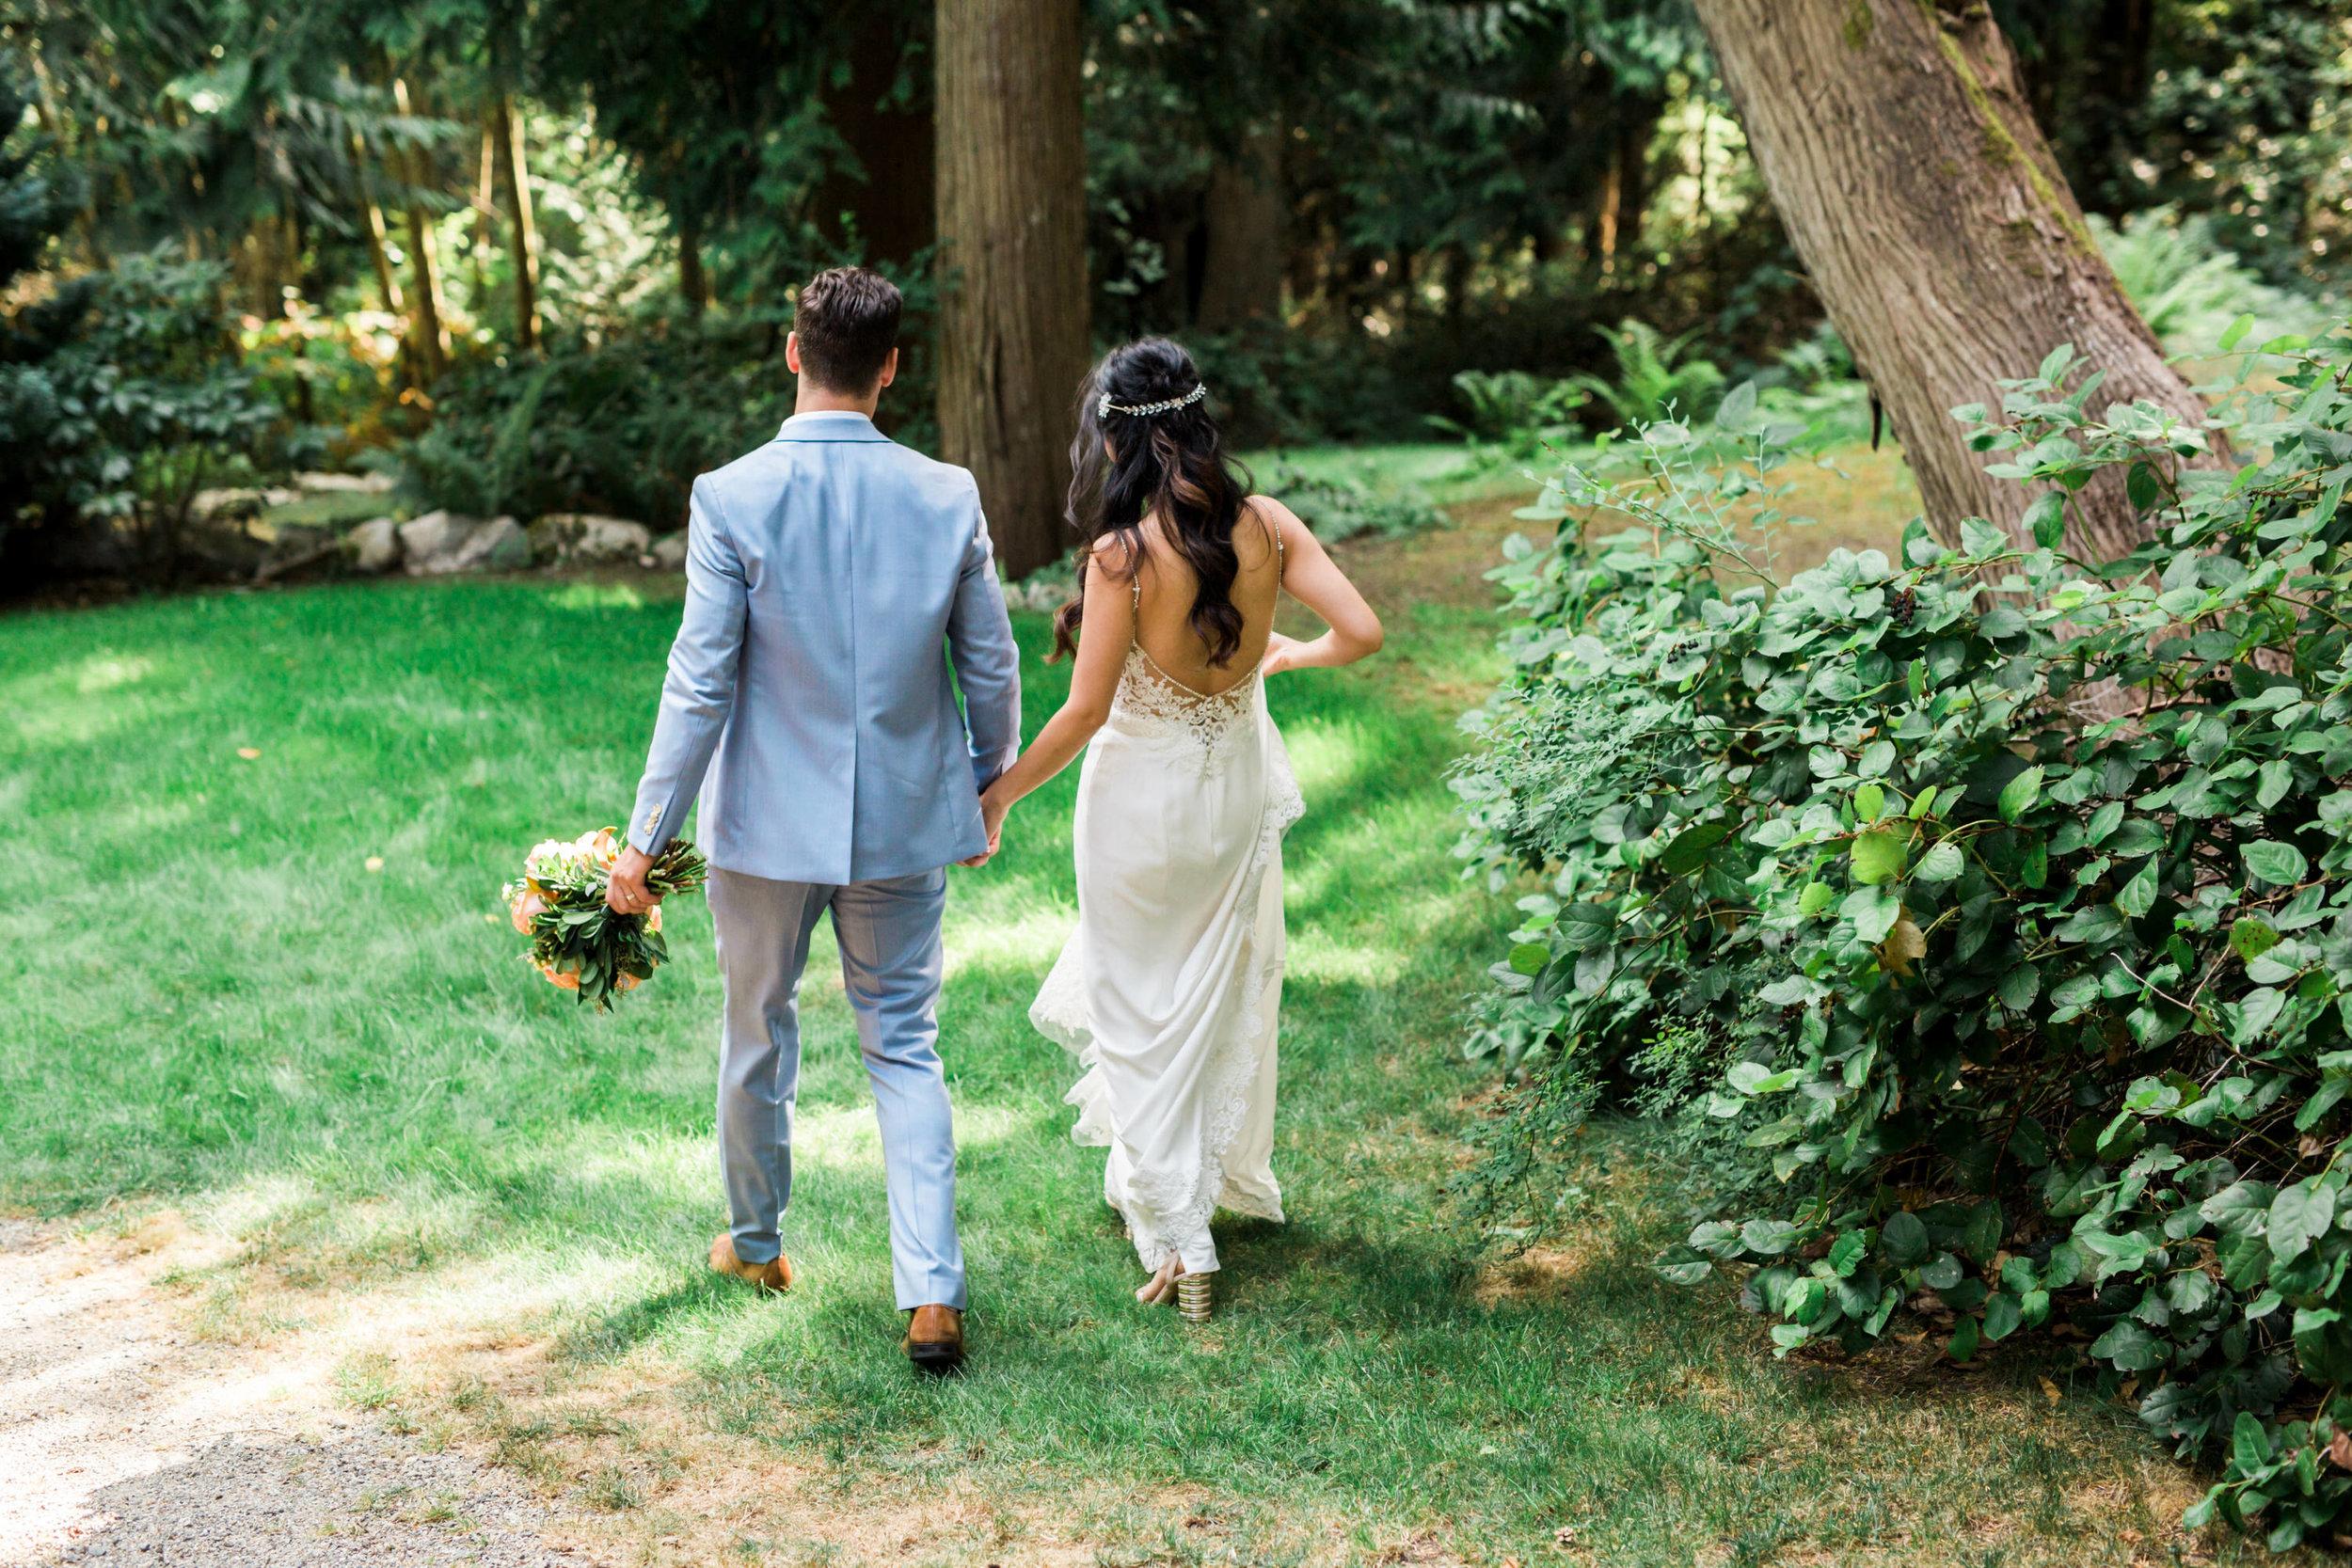 Linwood House Wedding Photos - Roberts Creek Wedding Photos - Vancouver Wedding Photographer & Videographer - Sunshine Coast Wedding Photos - Sunshine Coast Wedding Photographer - Jennifer Picard Photography - IMG_7955_1.jpg